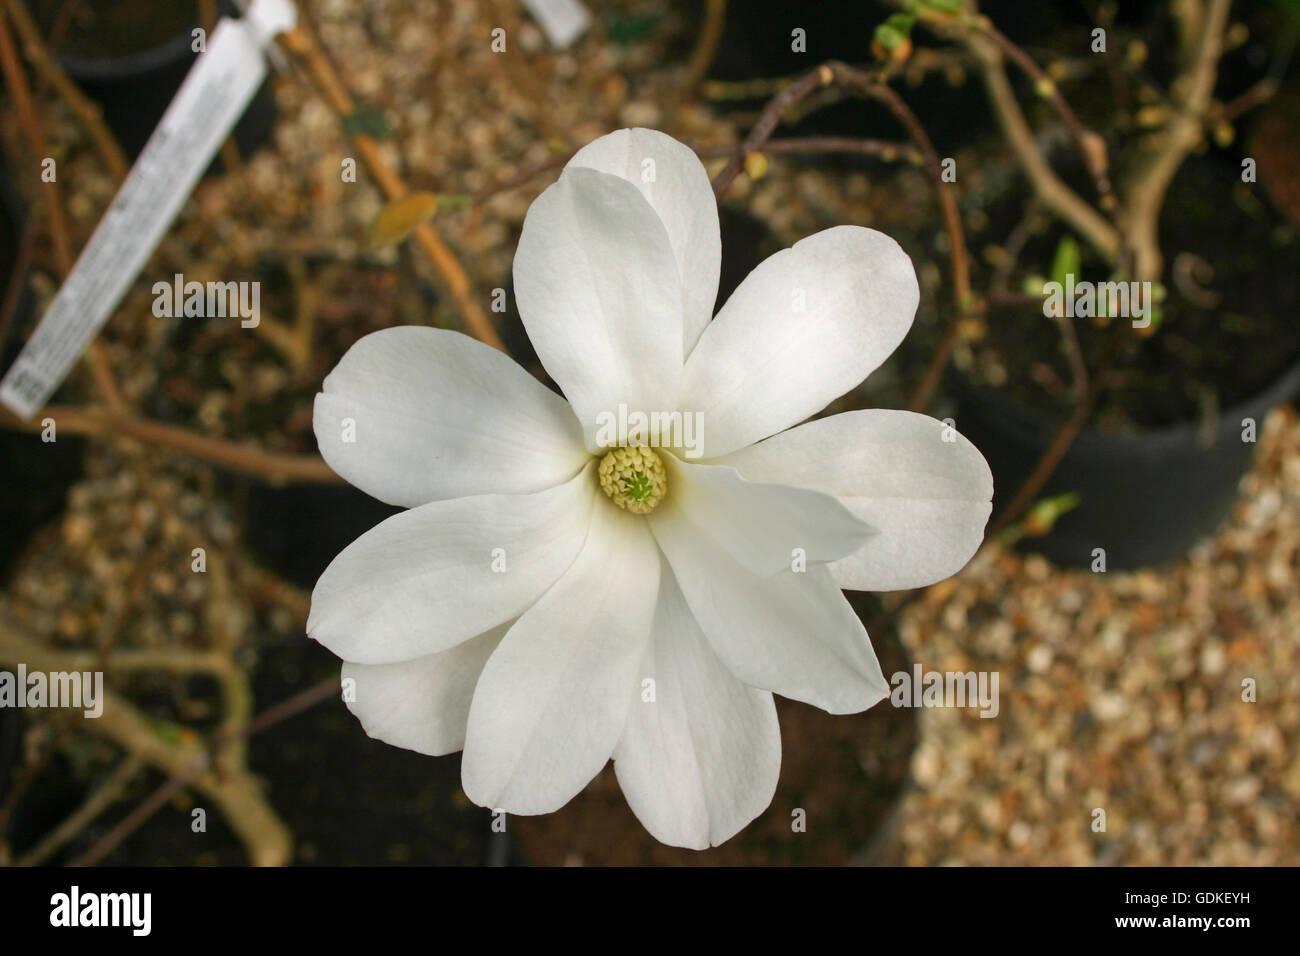 White Magnolia Flower In A Plant Pot Stock Photo 111681573 Alamy